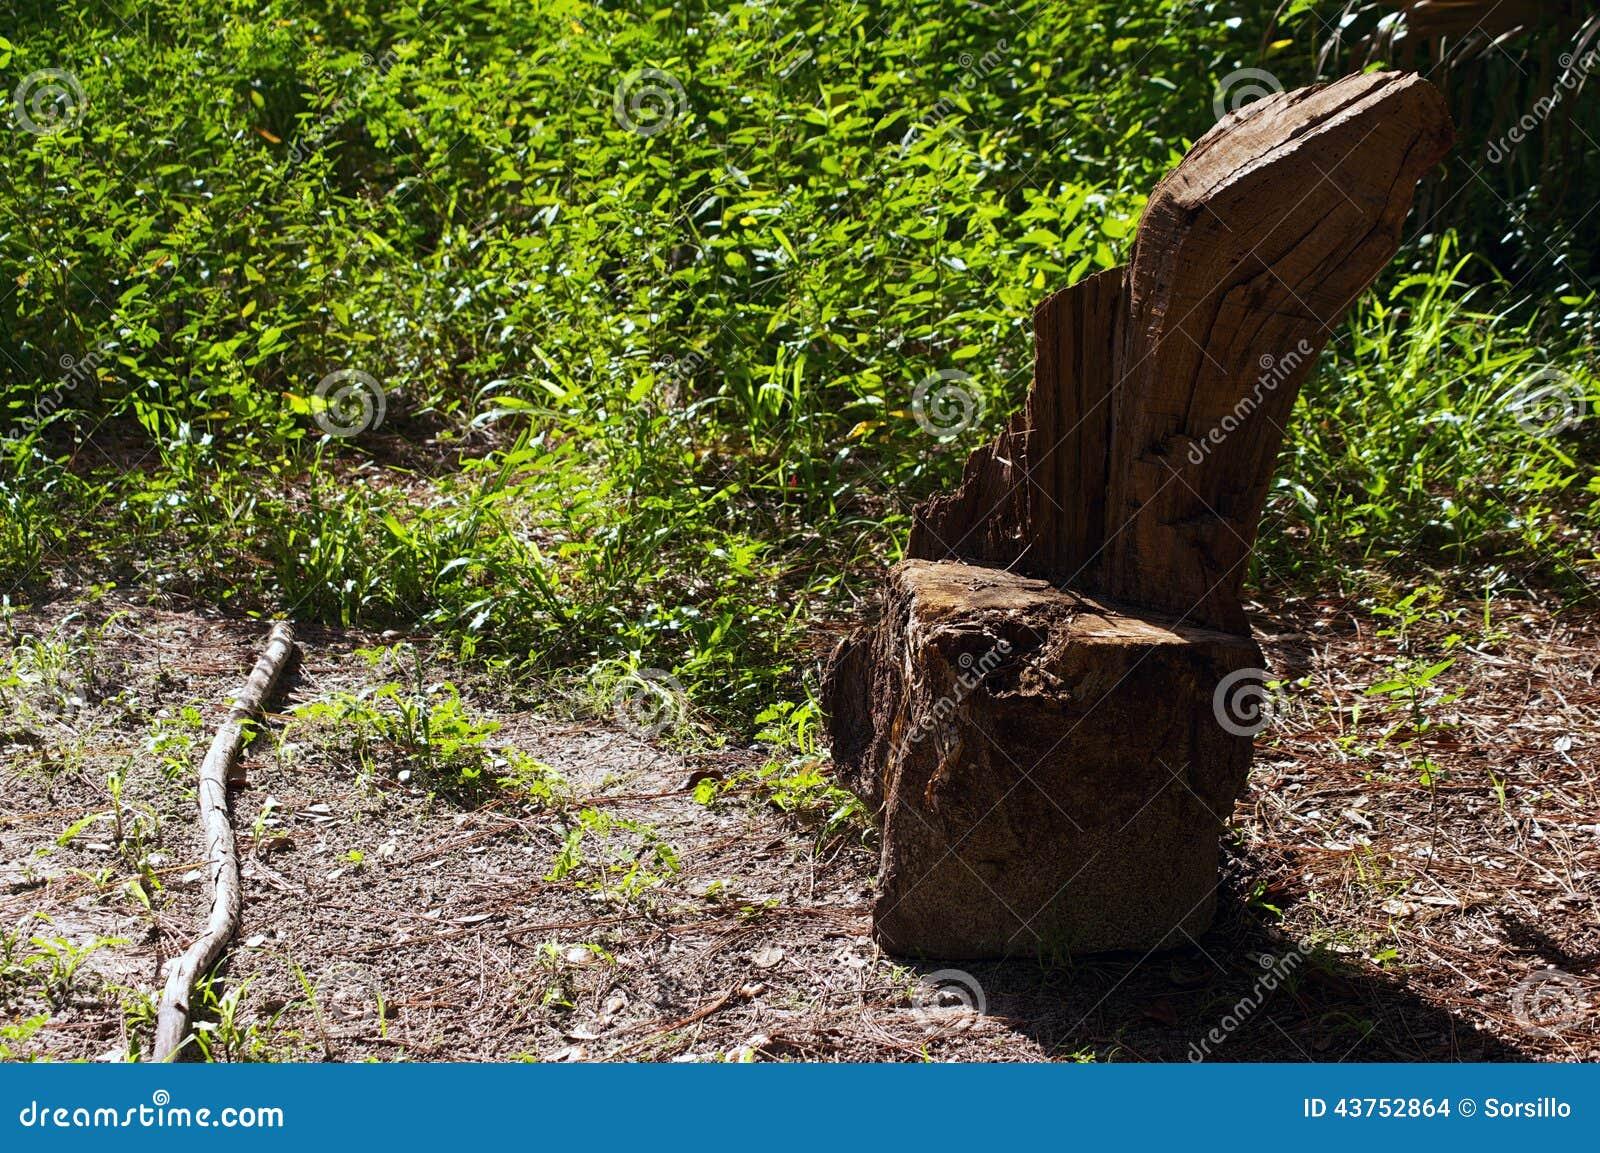 Tree Stump Seats Rustic Tree Stump Seat Stock Photo Image 43752864